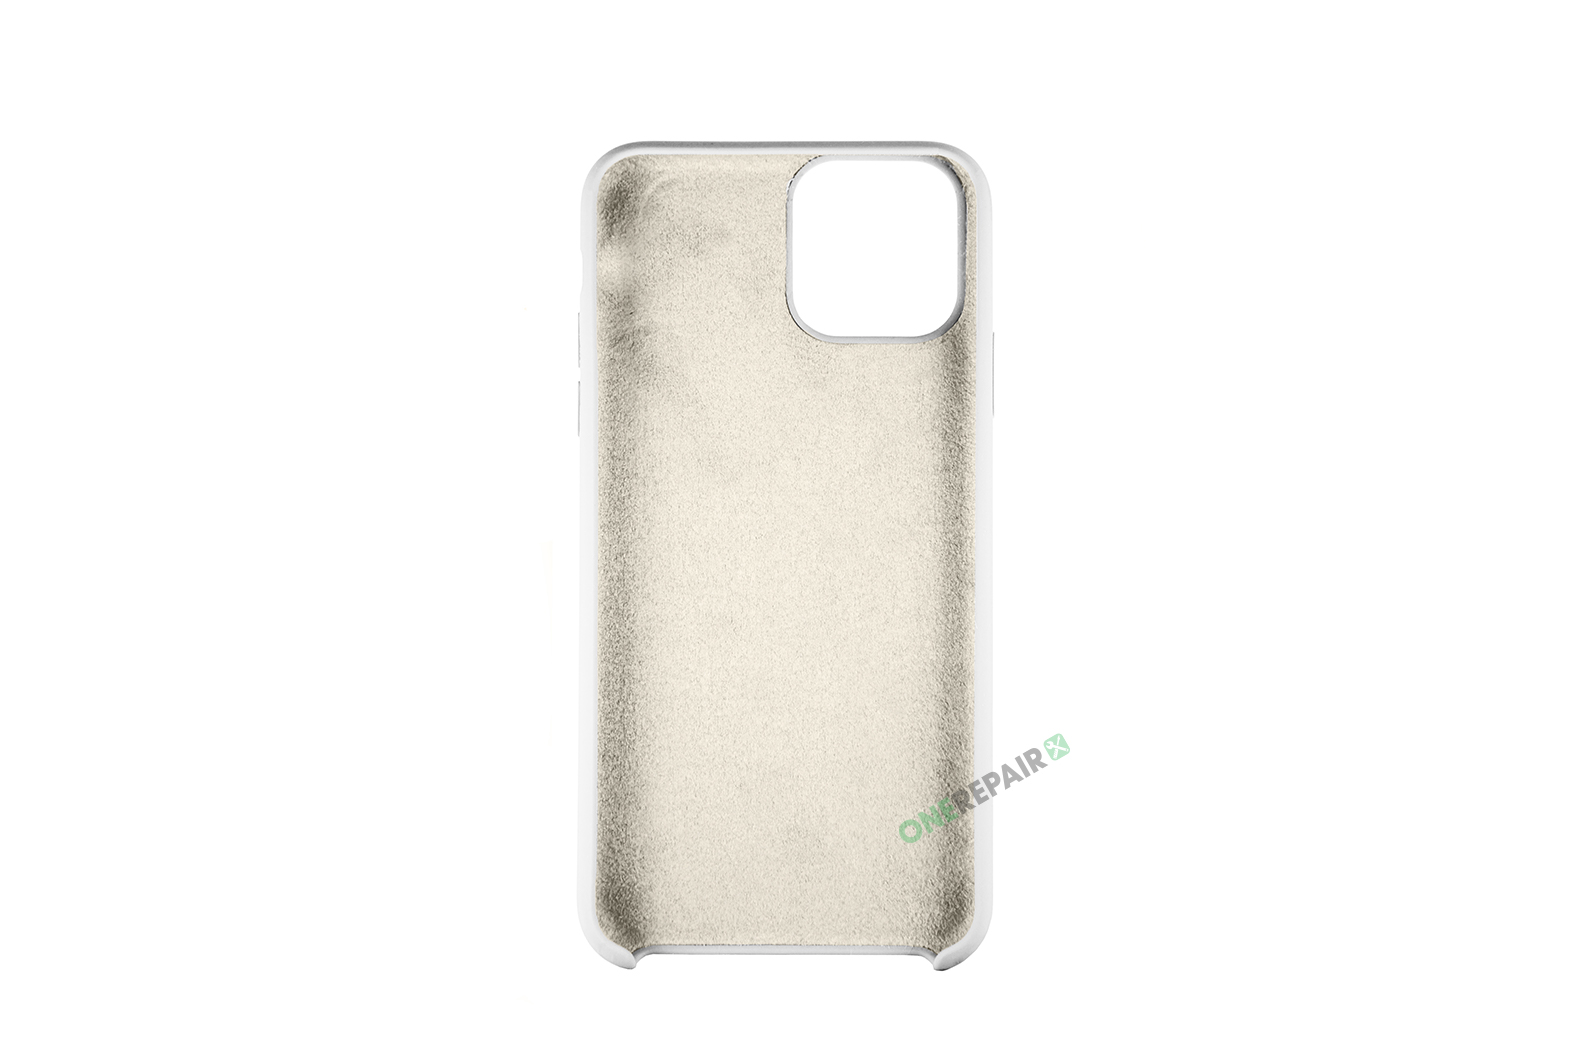 353778-002_iPhone_11_pro_silikone_cover_blaa_OneRepair_00002